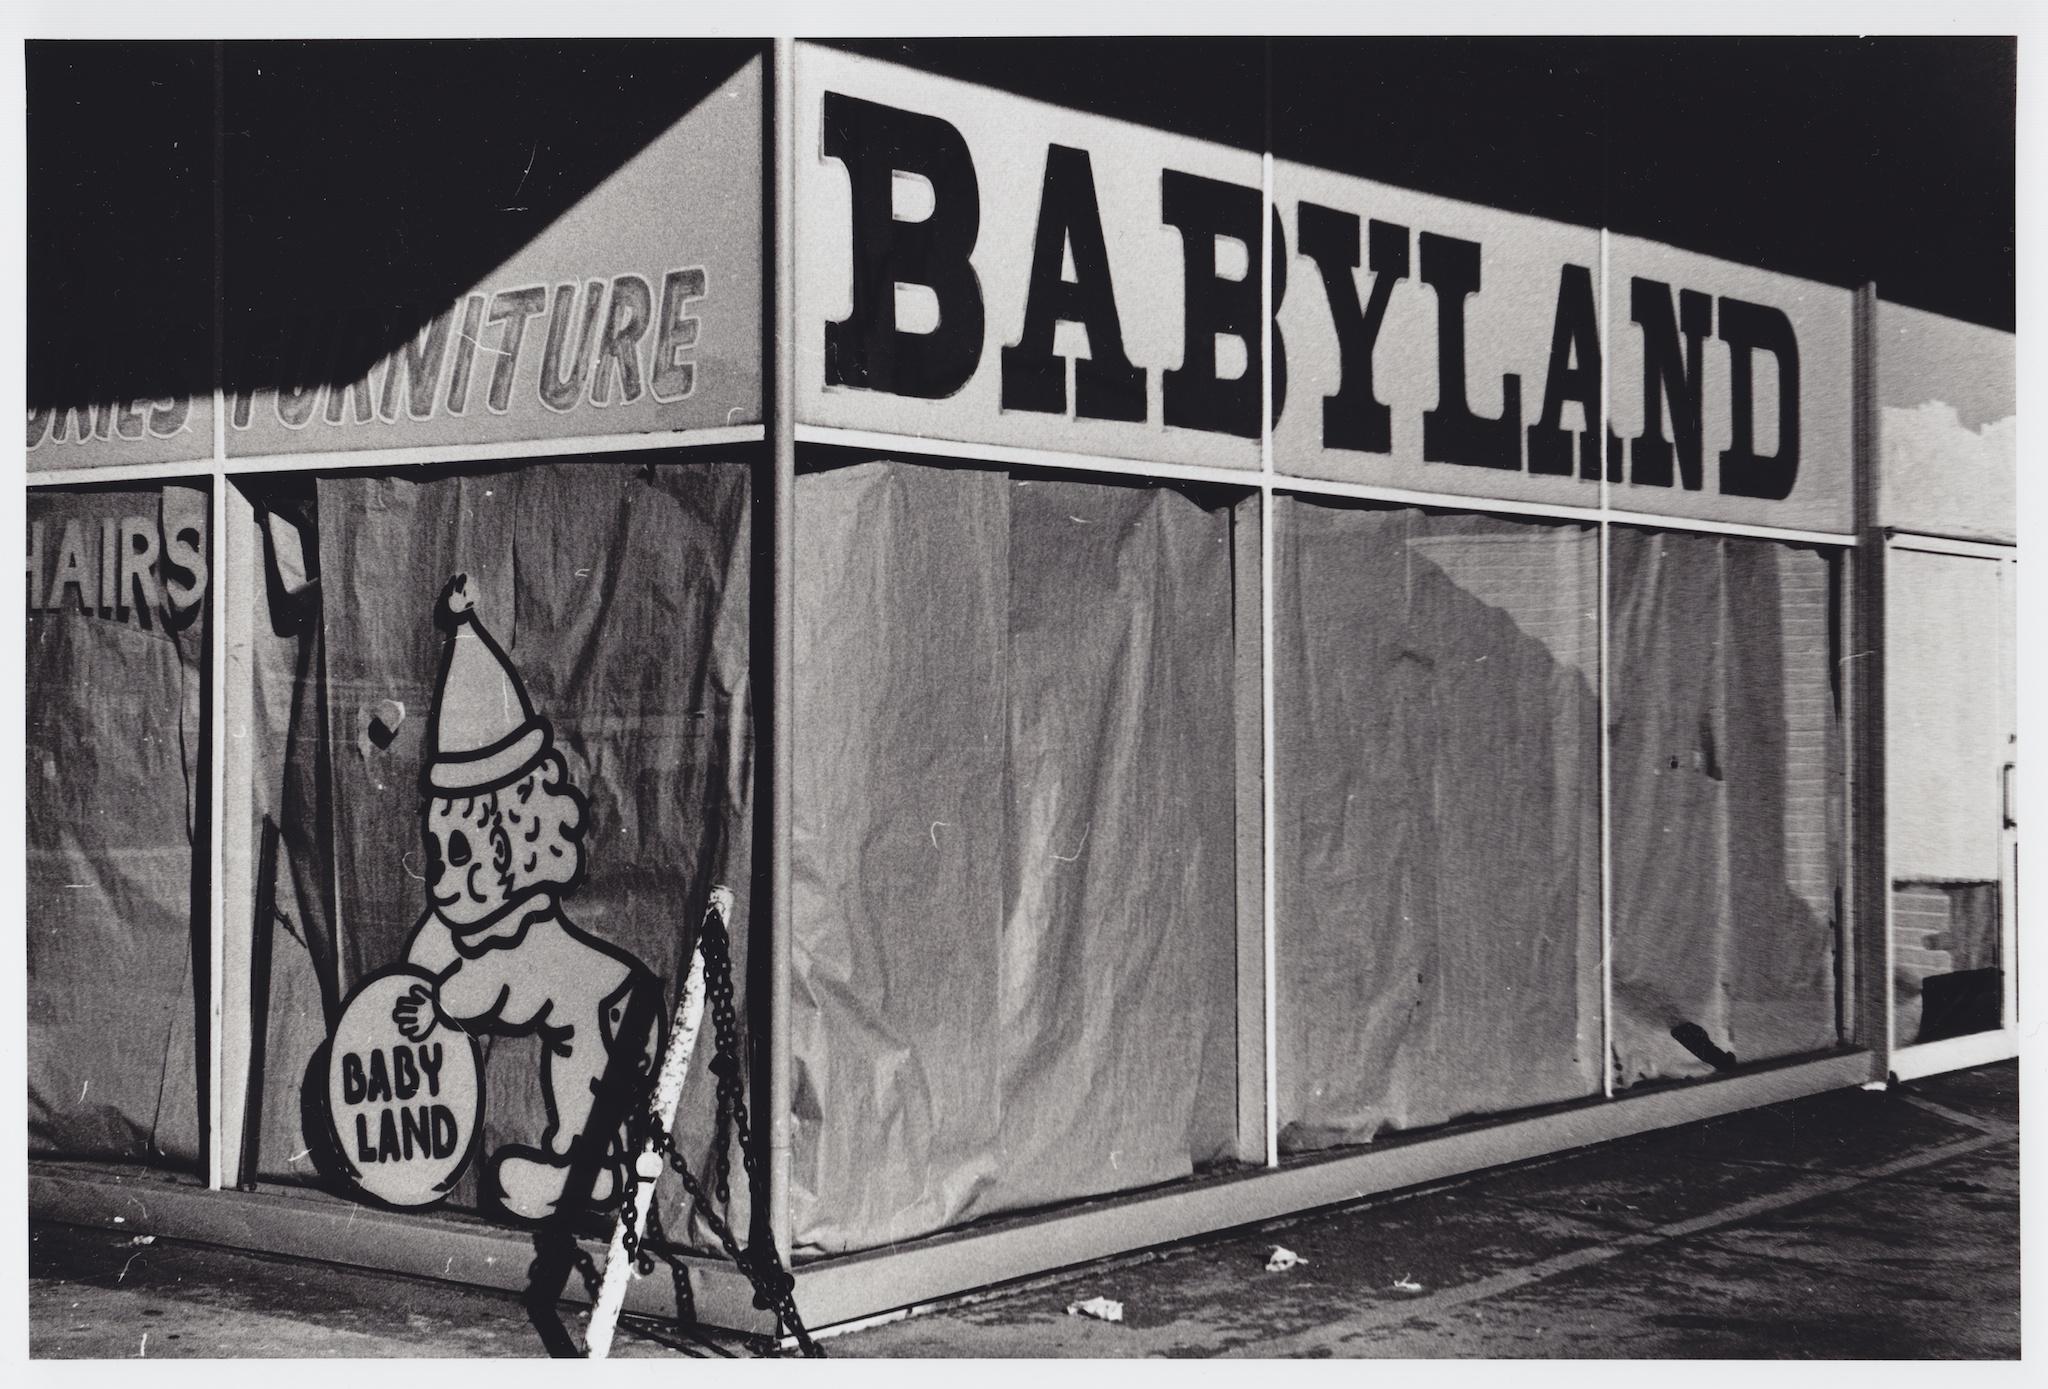 Babyland 1